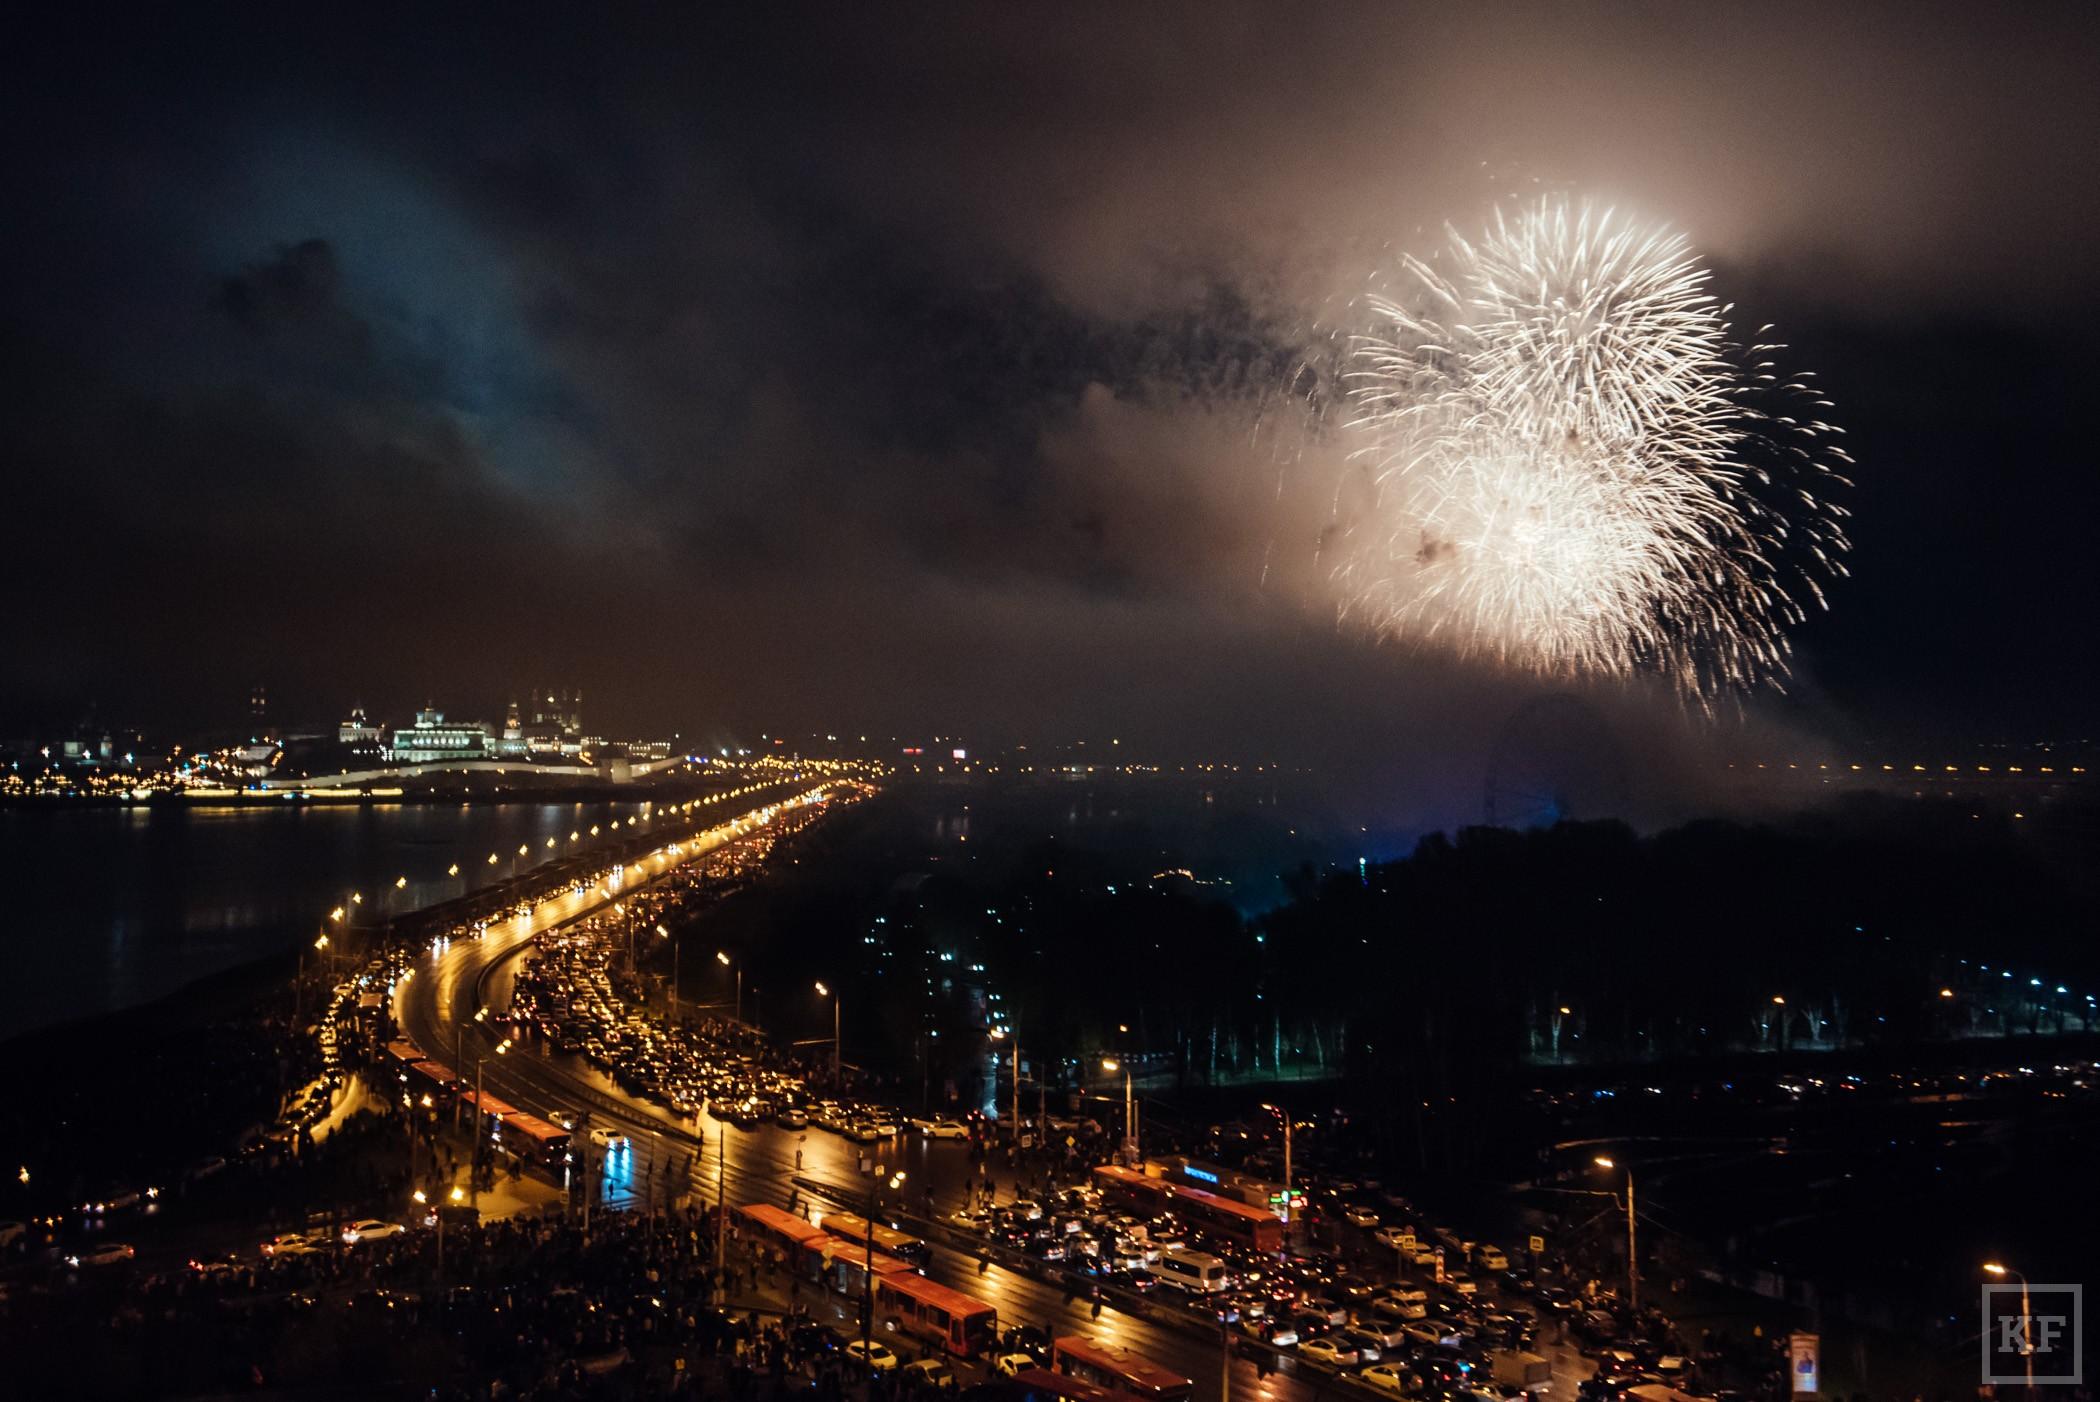 фото день татарстана с праздником хотя звезда